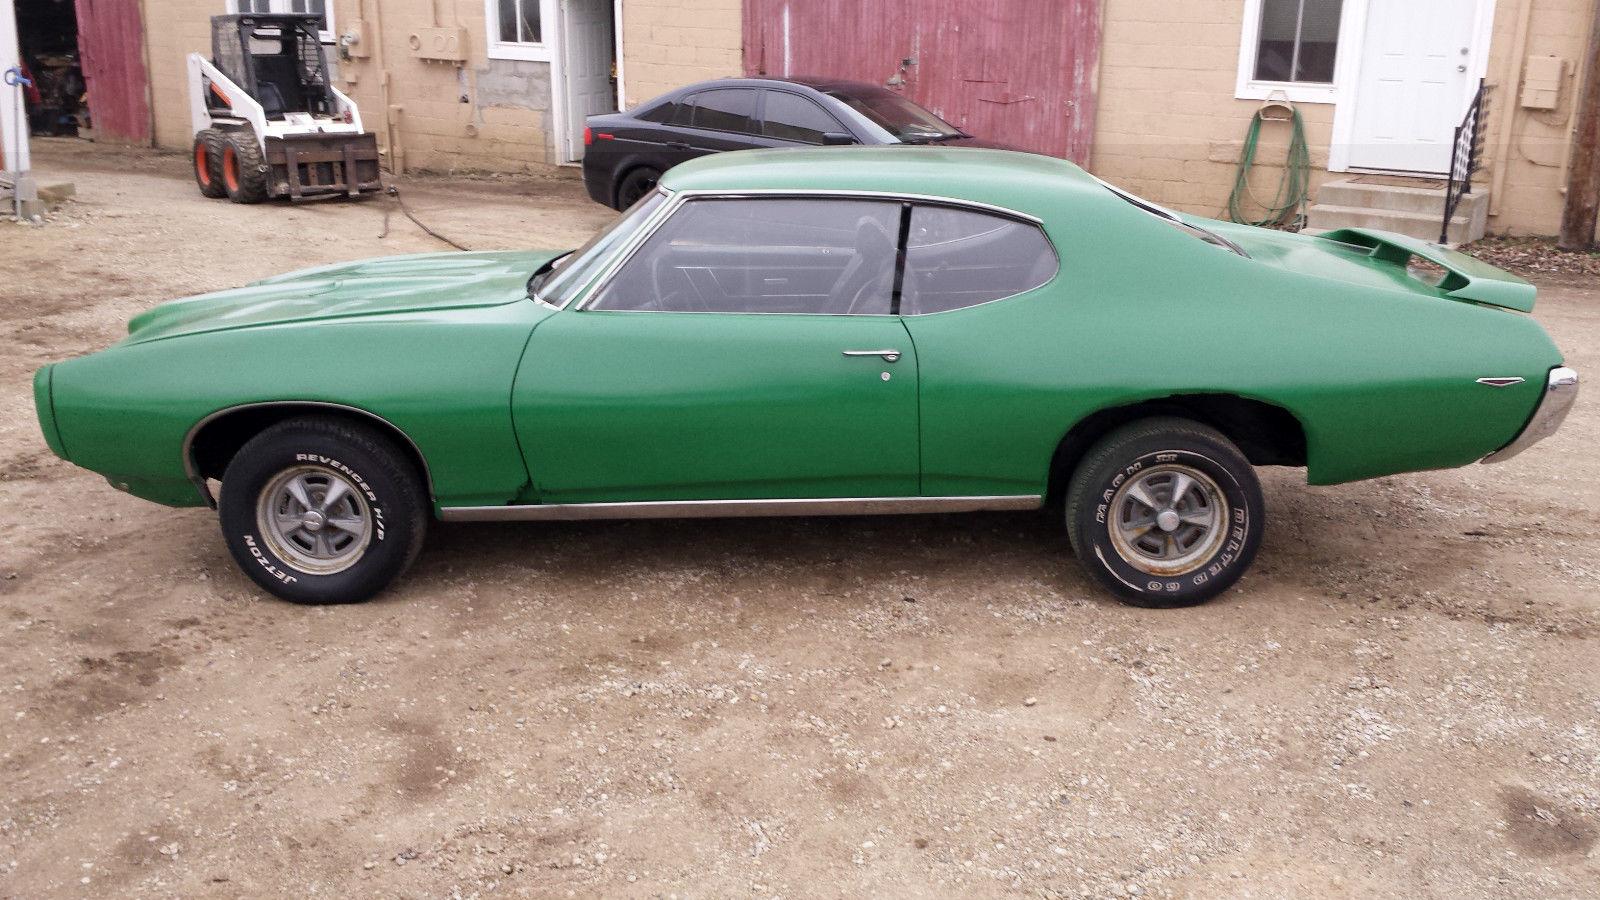 1969 Pontiac Gto Judge Ram Air Iii 4 Speed 390 Posi Hood Tach No Wiring Diagram Reserve Classic For Sale